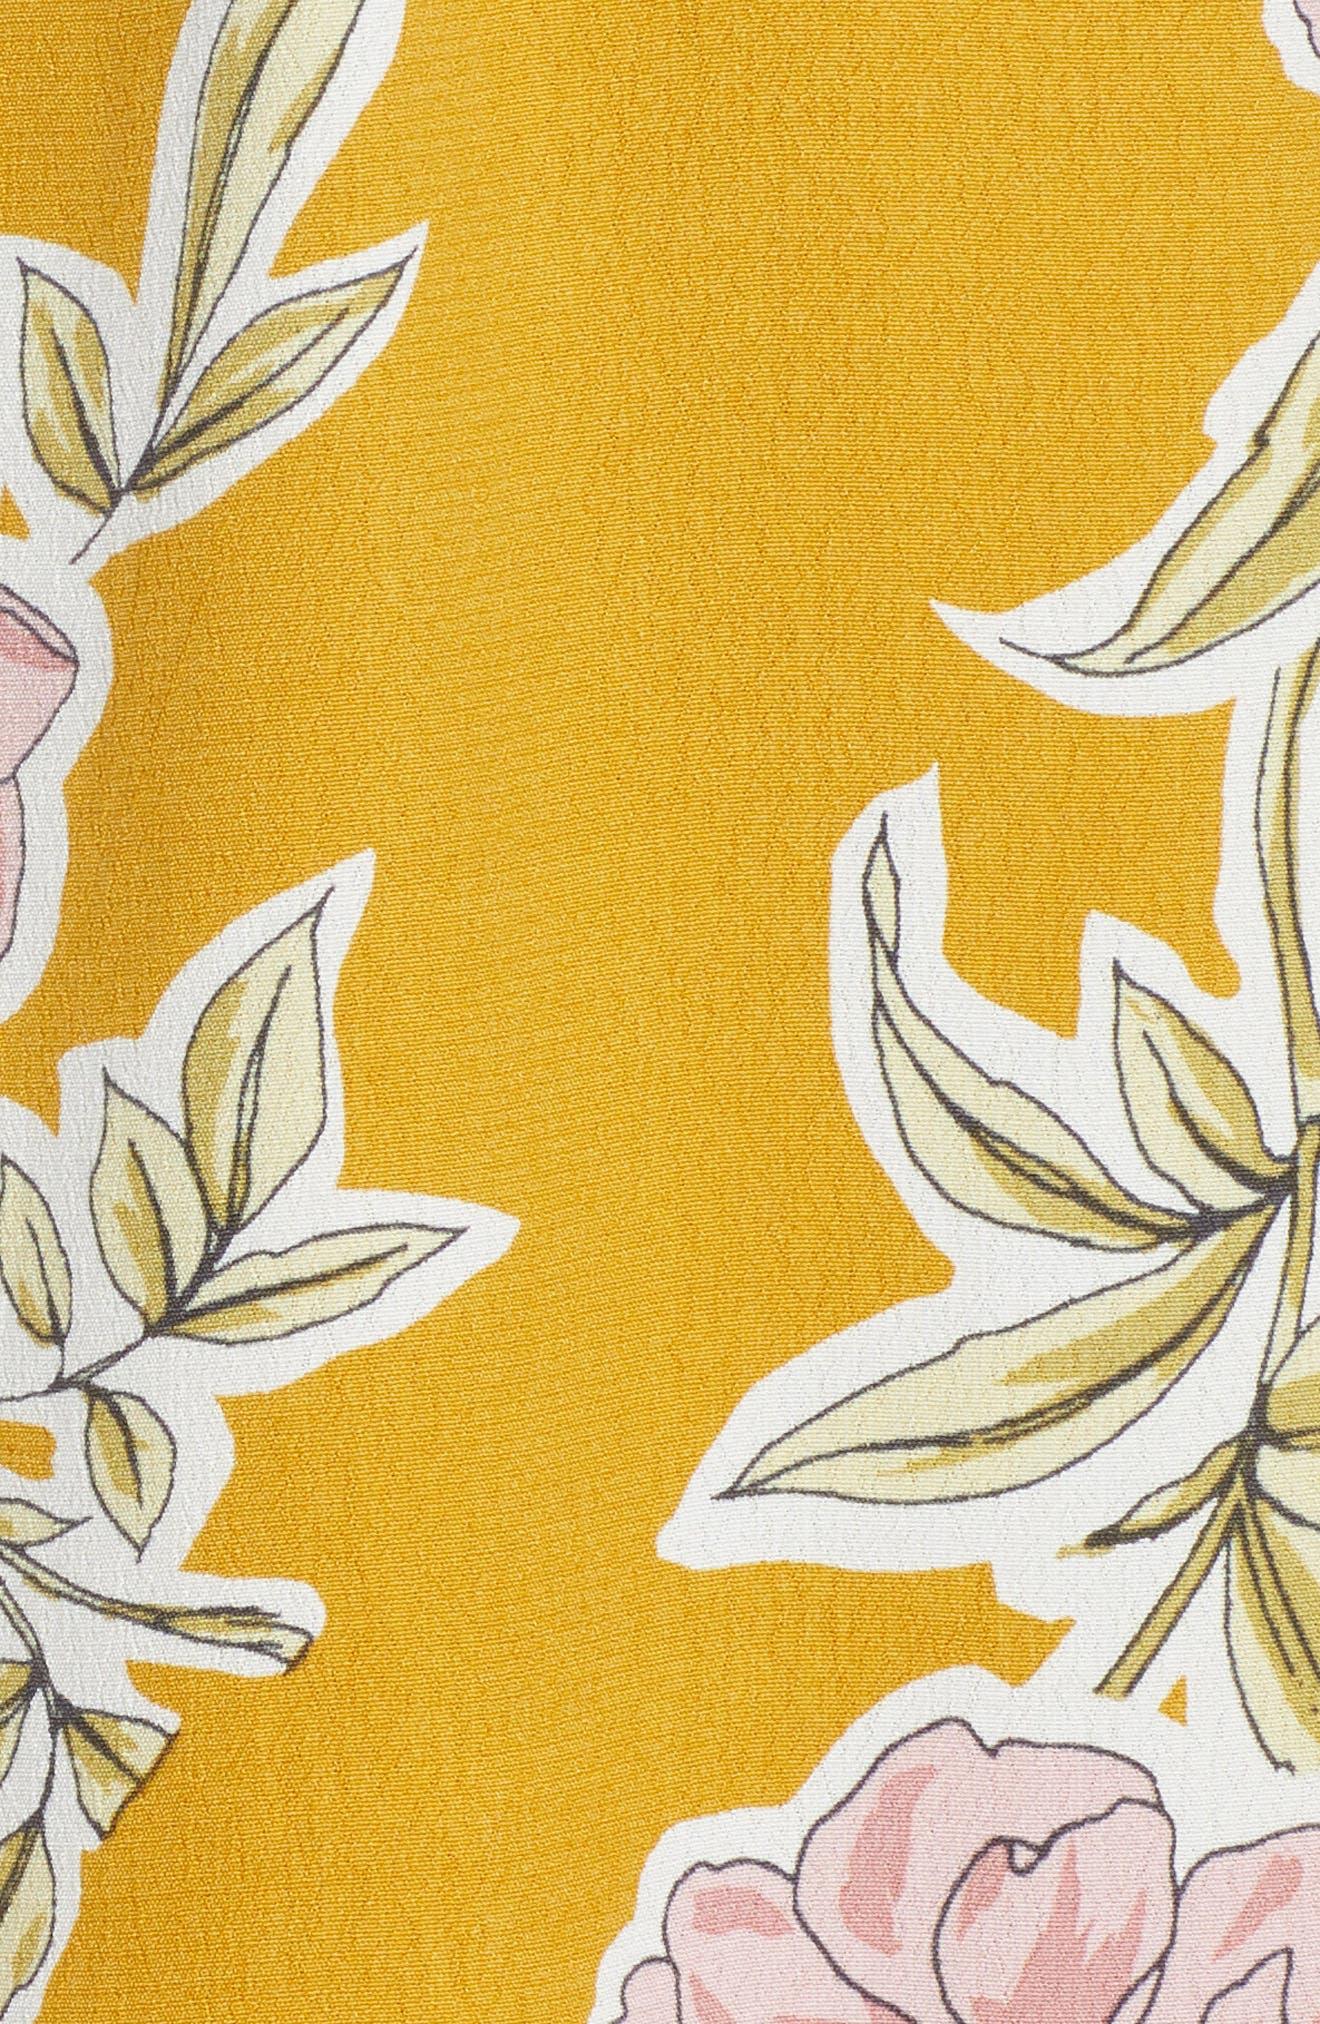 Fonda Cold Shoulder Halter Dress,                             Alternate thumbnail 6, color,                             Yellow Gold